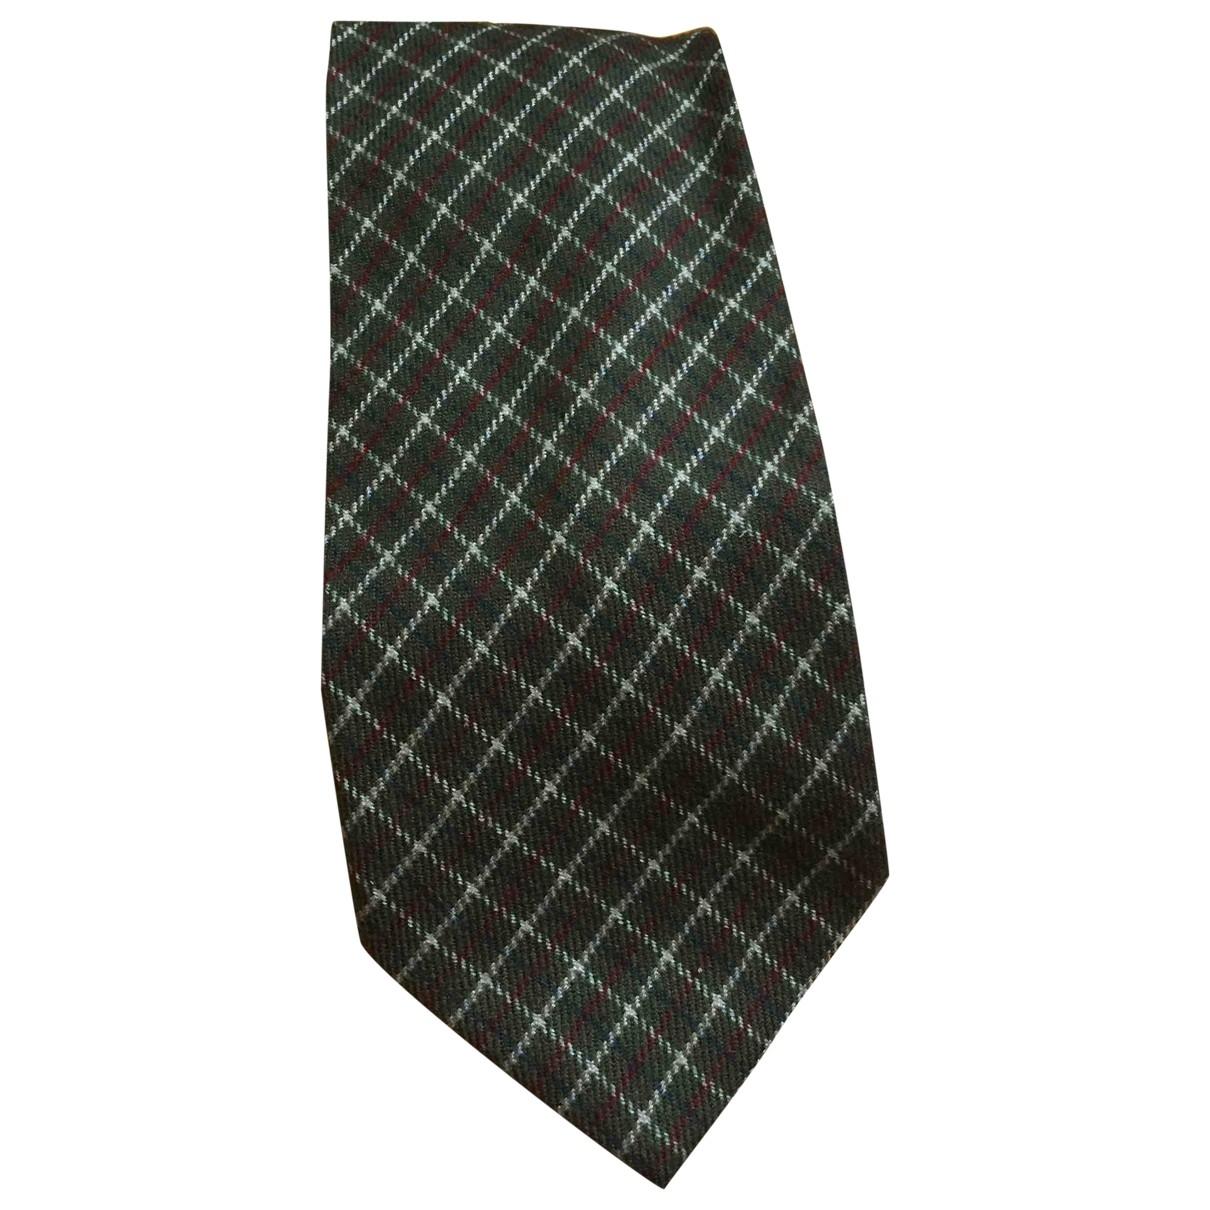 Saint Laurent \N Krawatten in  Gruen Kaschmir